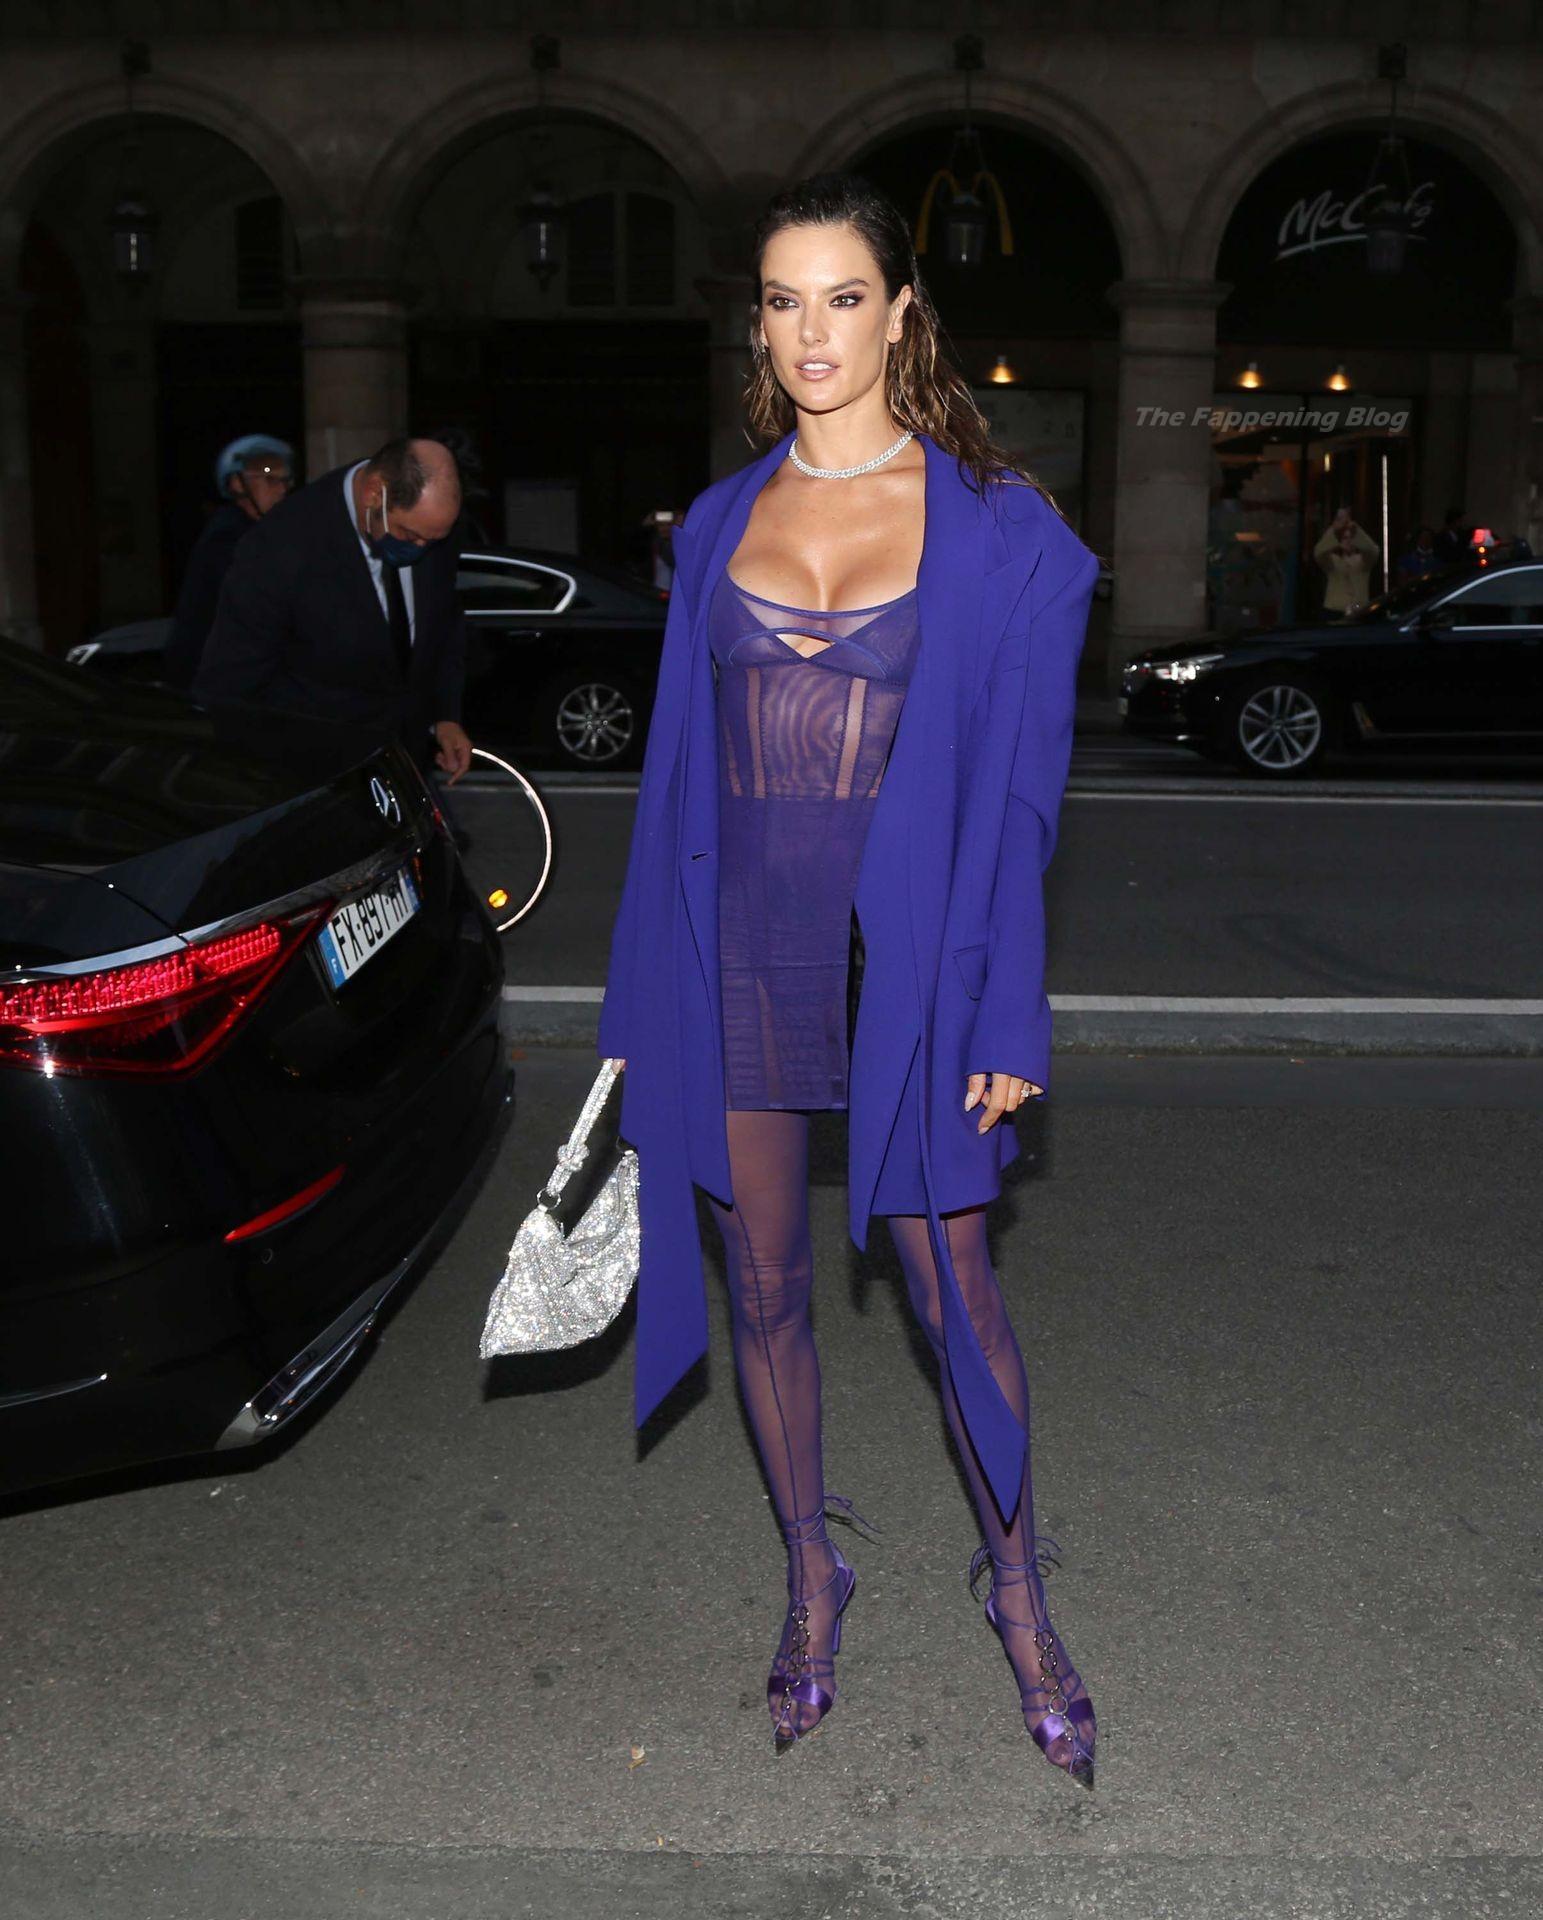 Alessandra-Ambrosio-Sexy-The-Fappening-Blog-35-2.jpg